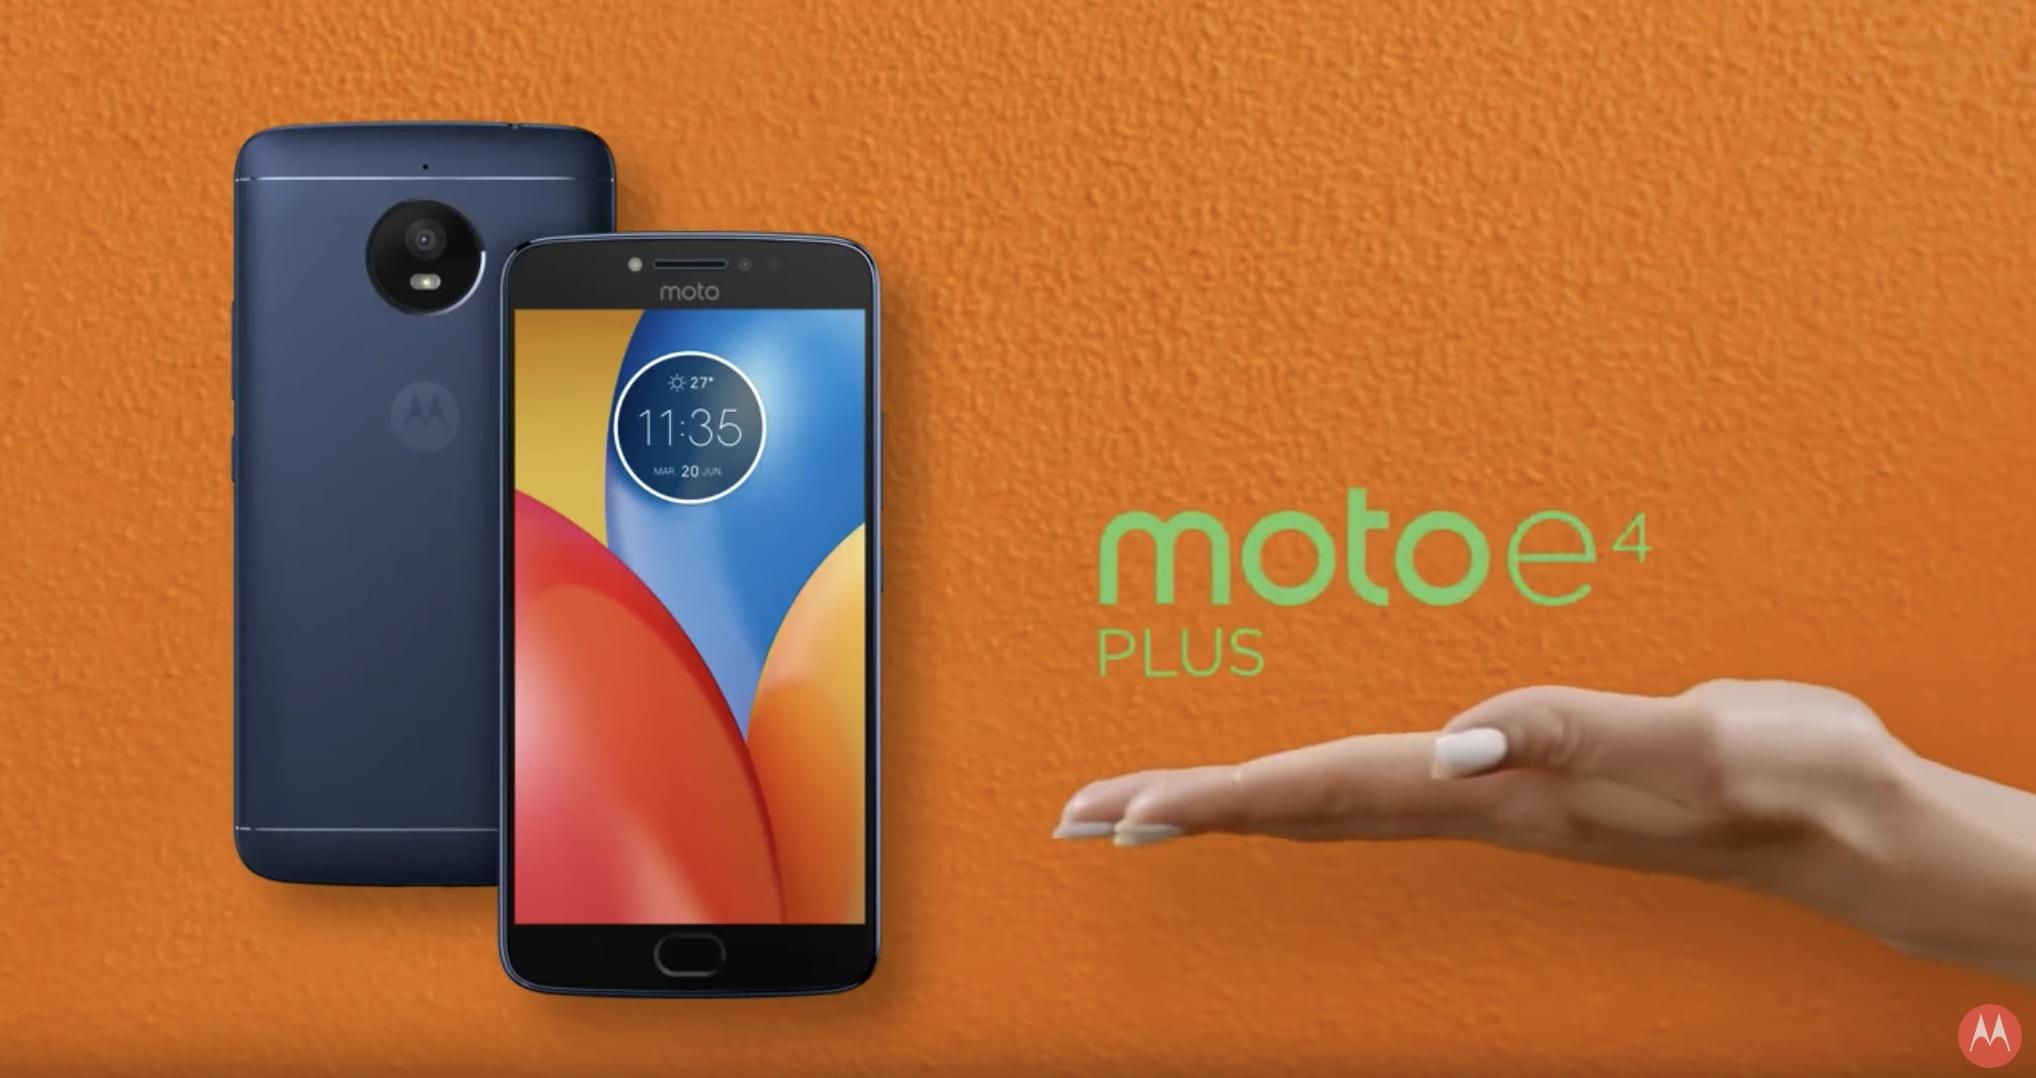 Motorola e4 Launch    Role :  Photographer